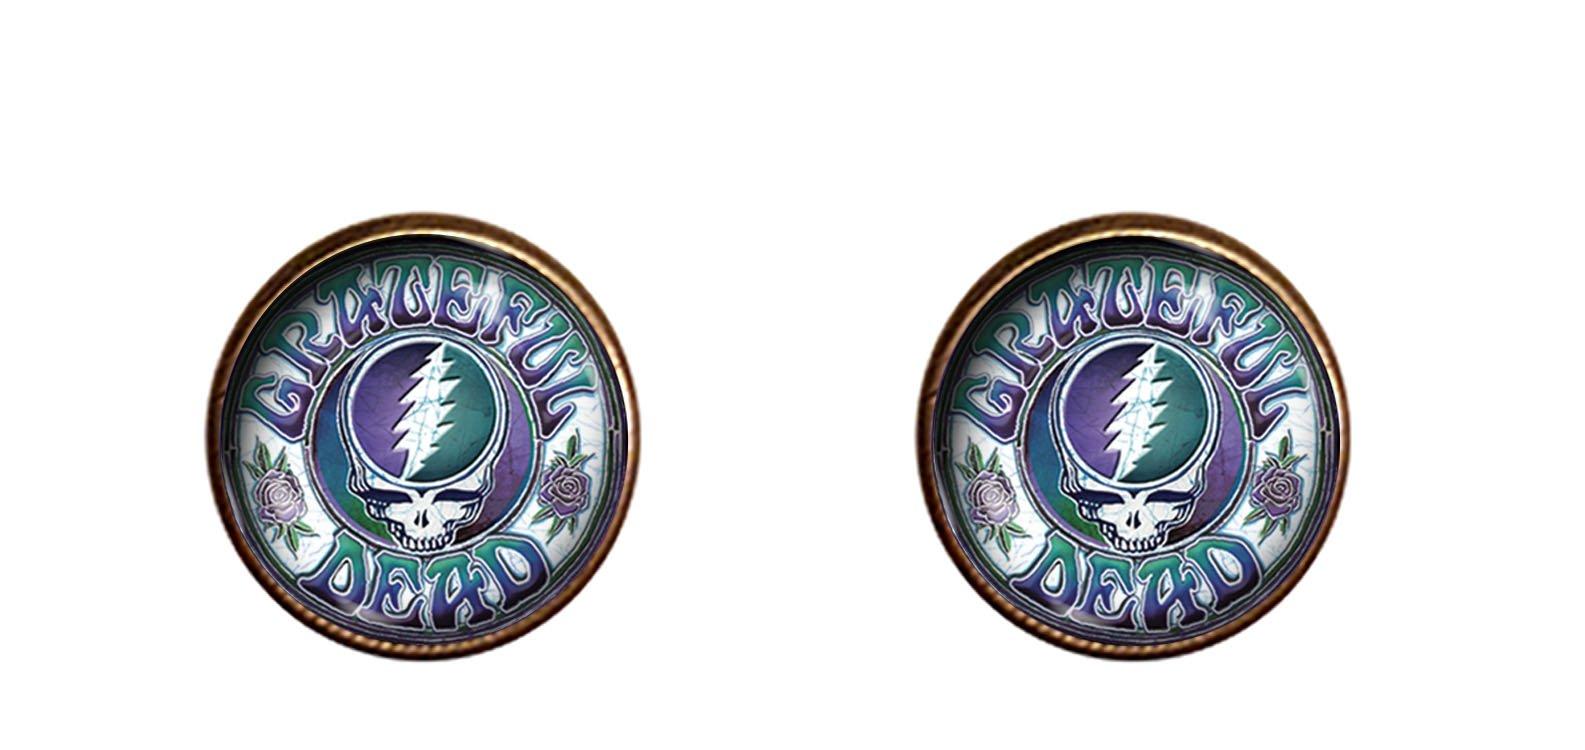 Grateful Dead Skull cuff links 16mm handmade jewelry gift charm